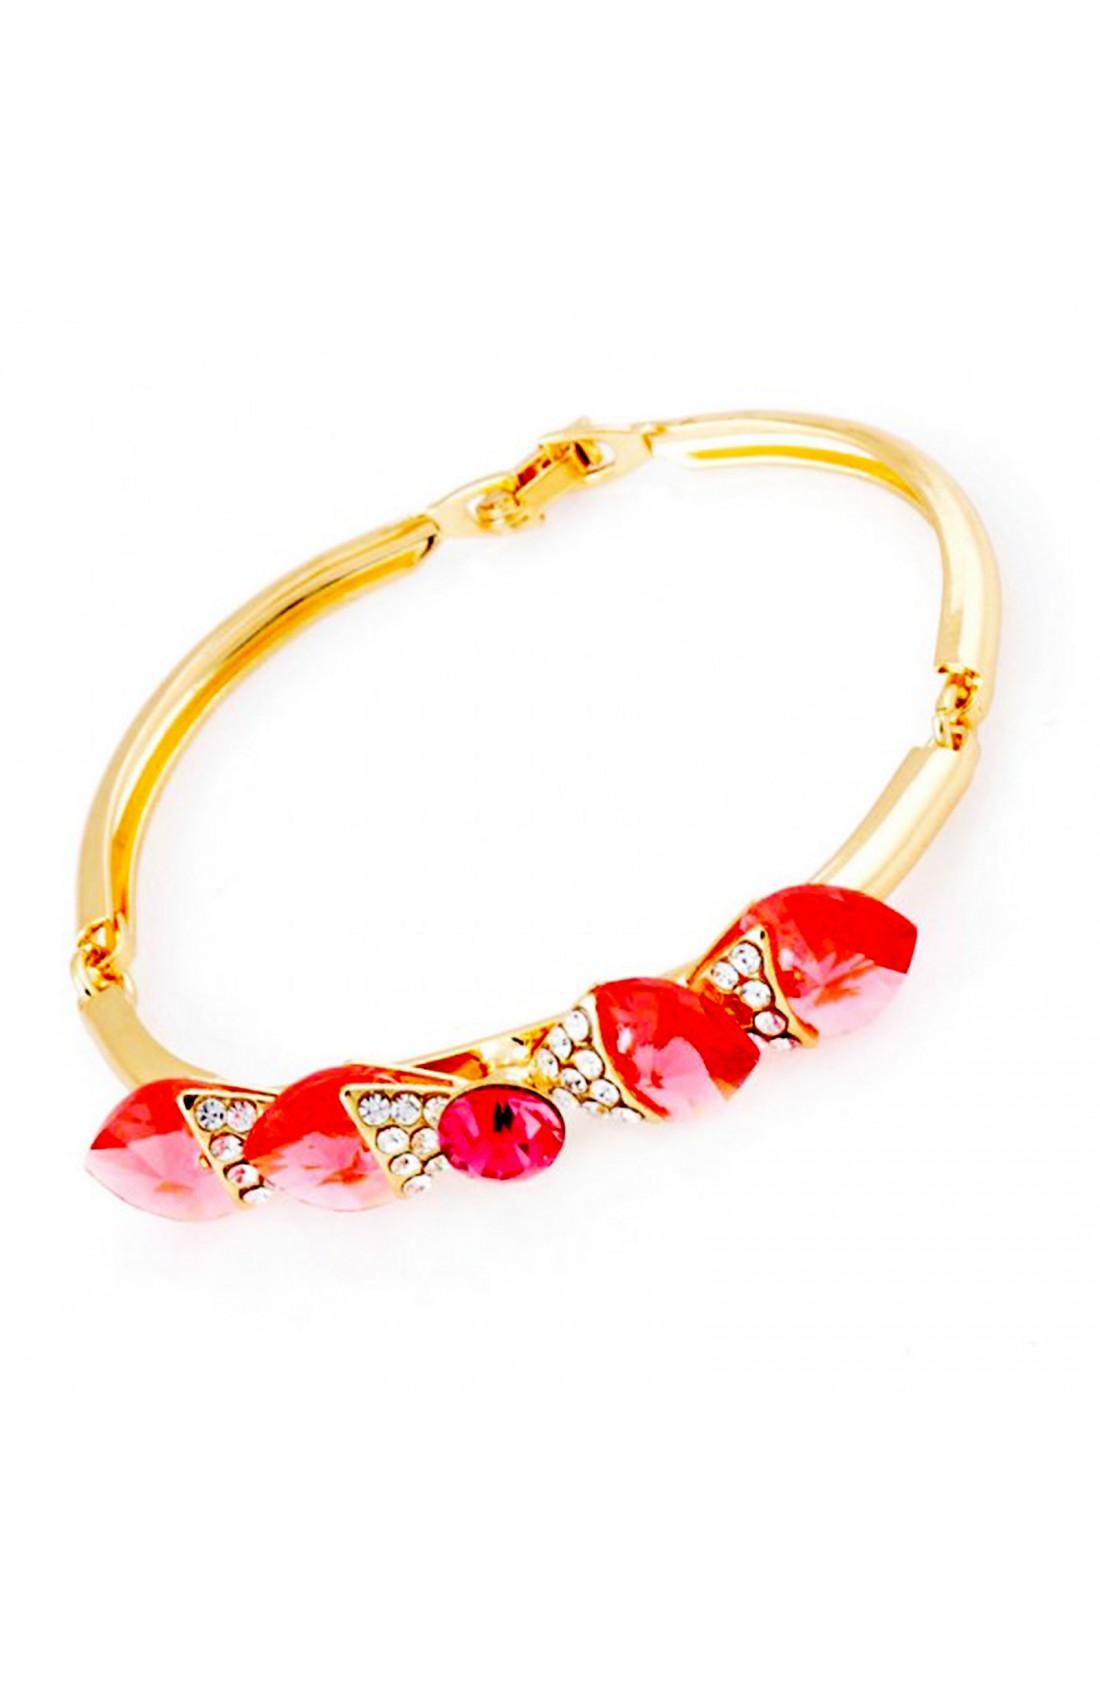 14K Gold Plated Crystal Bowknot Flower Bracelet